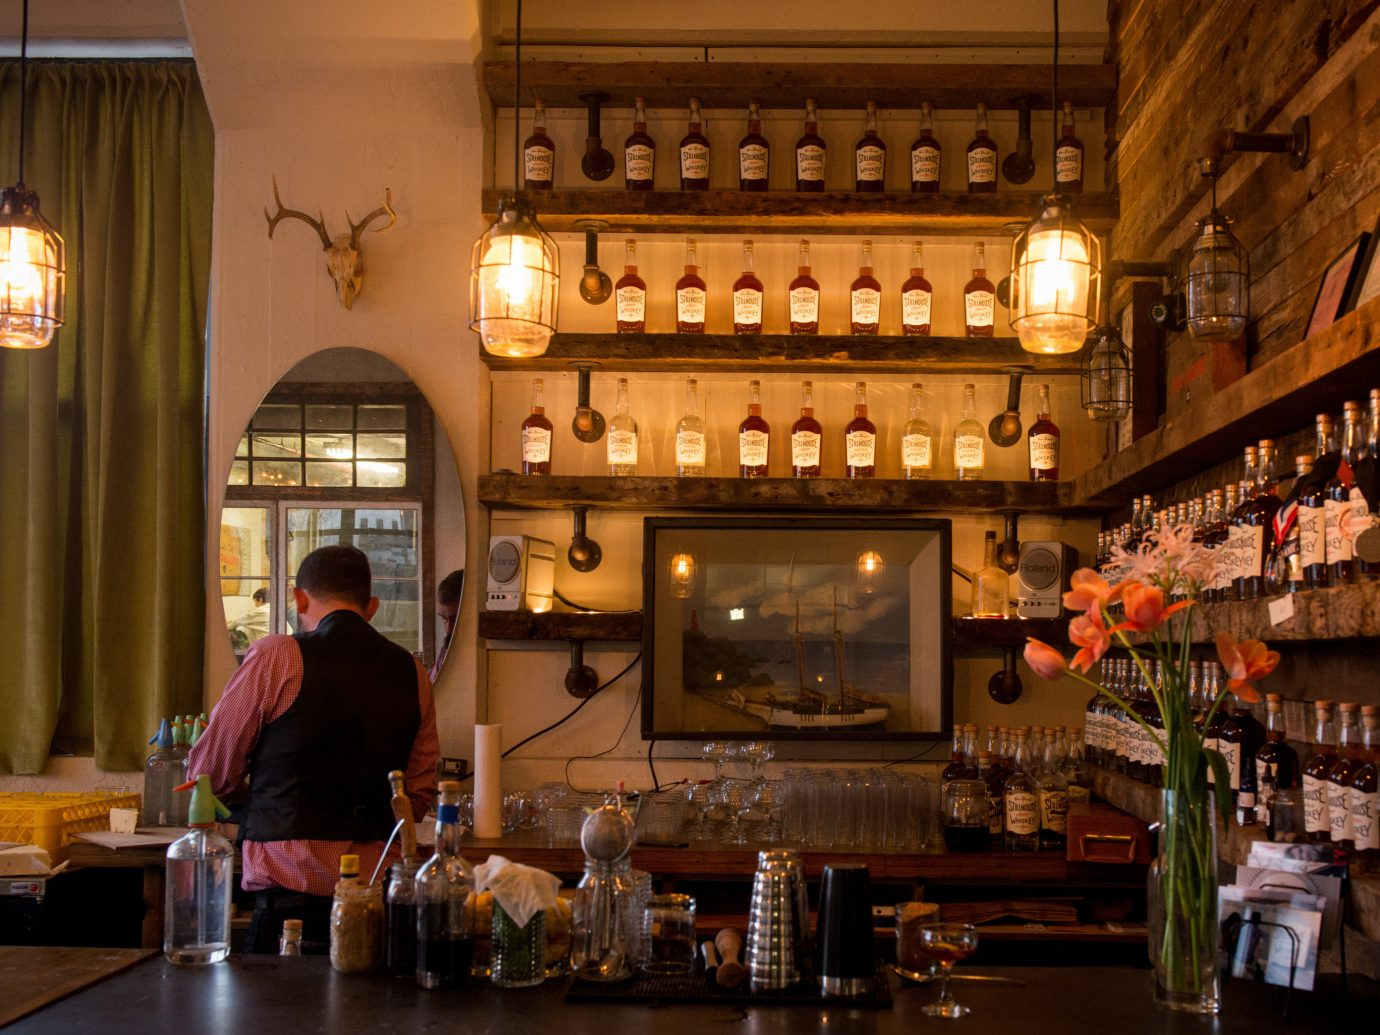 Brooklyn Food + Drink indoor person Bar restaurant tavern interior design café distilled beverage pub coffeehouse dining room